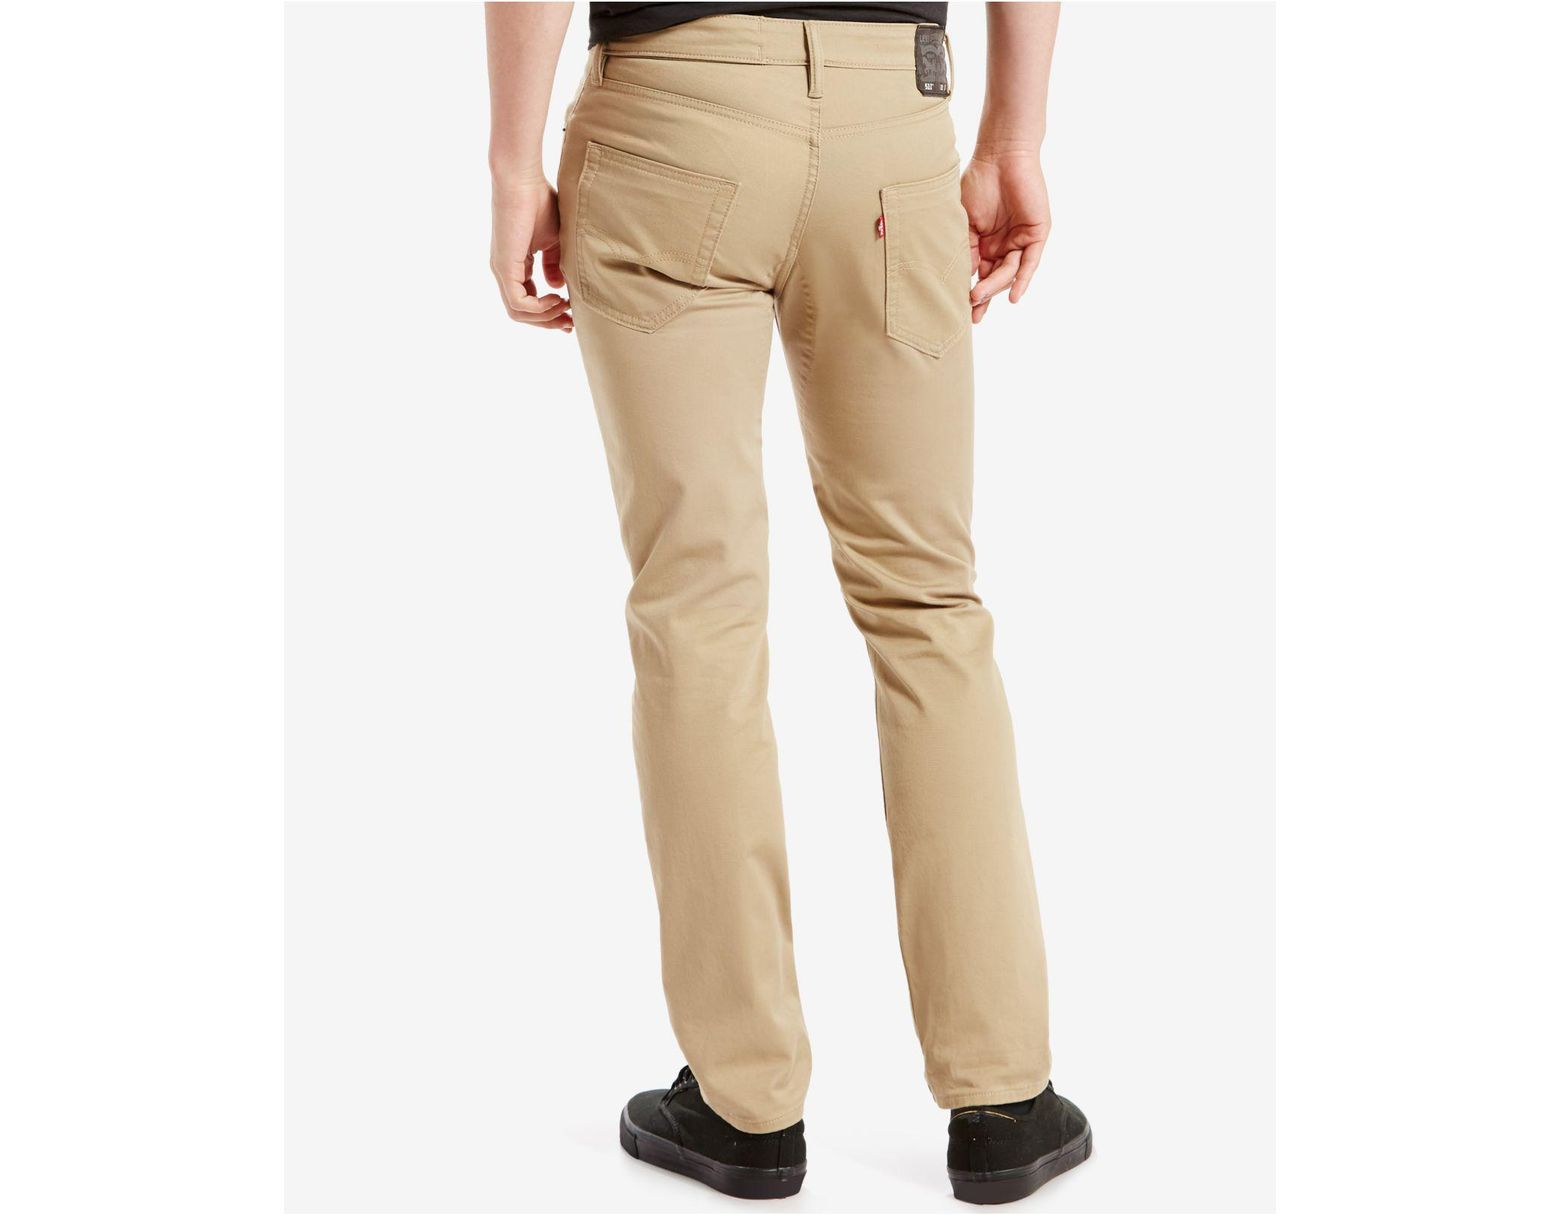 2ce4778e945 Levi's 511 Slim-fit Commuter Jeans in Metallic for Men - Lyst